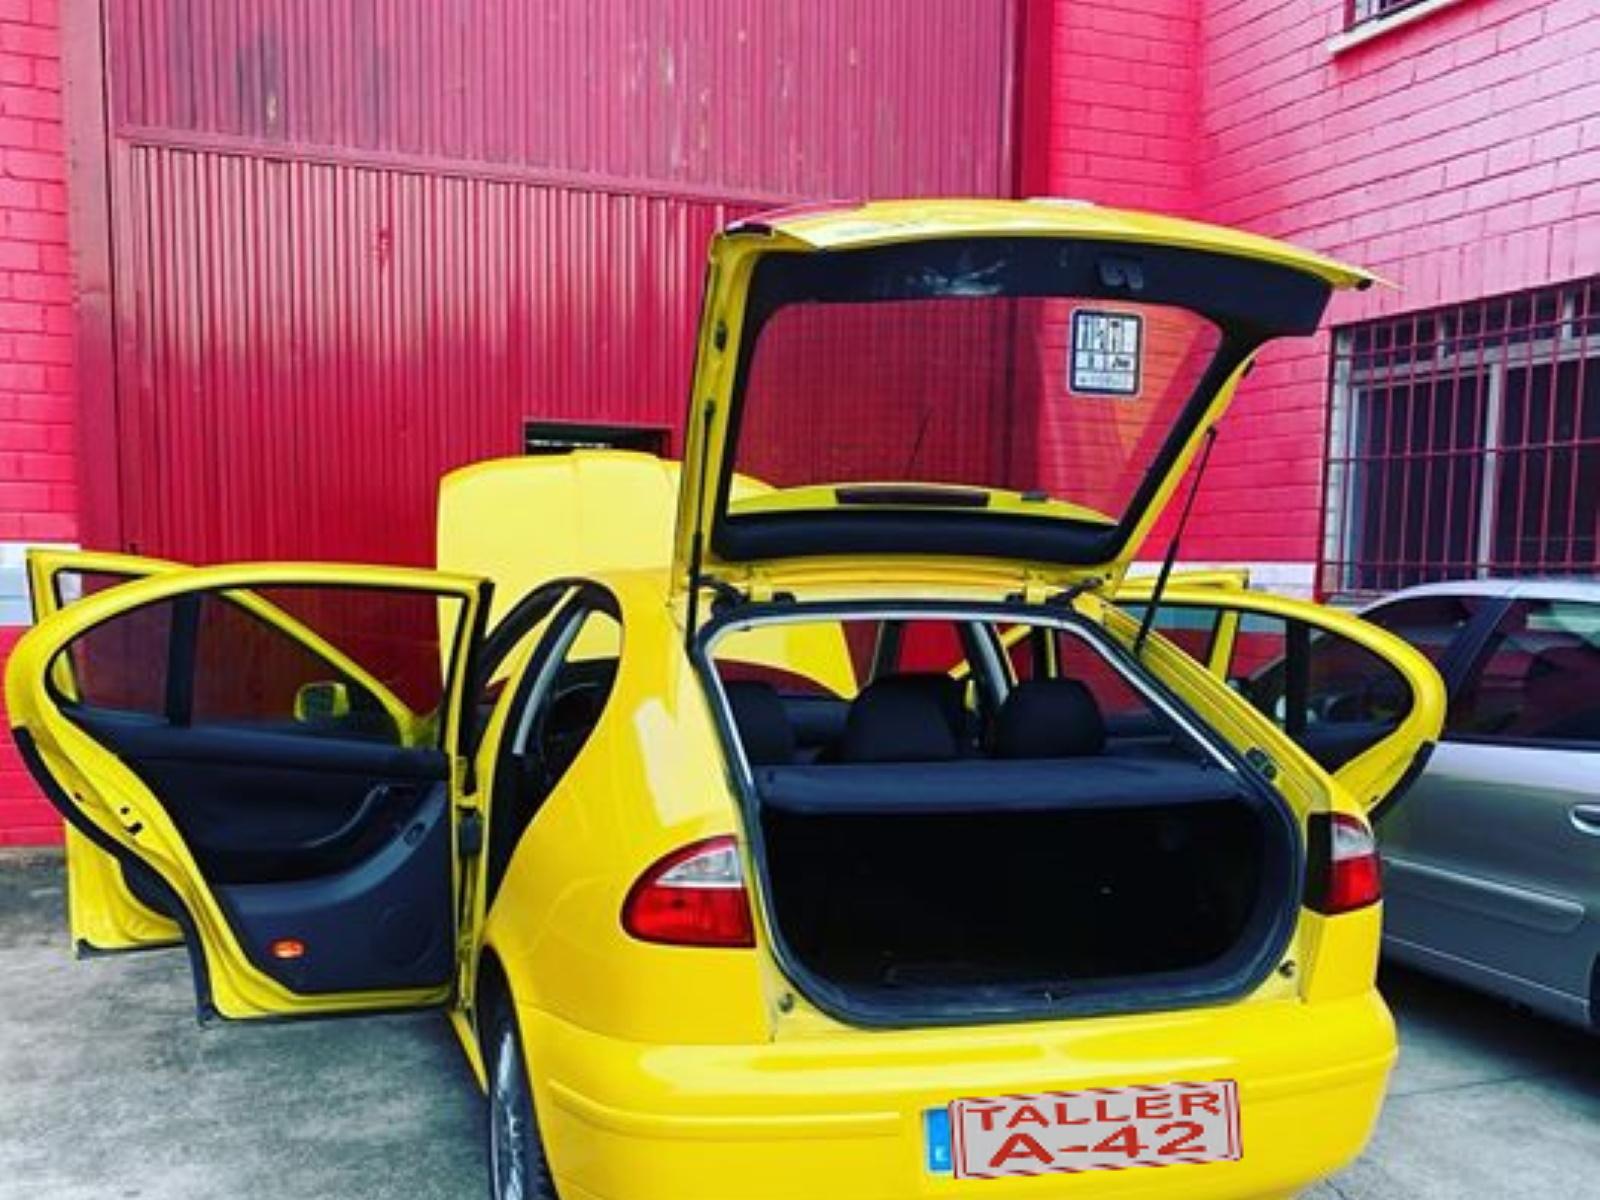 Venta Seat leon fr 1.8 turbo toledo